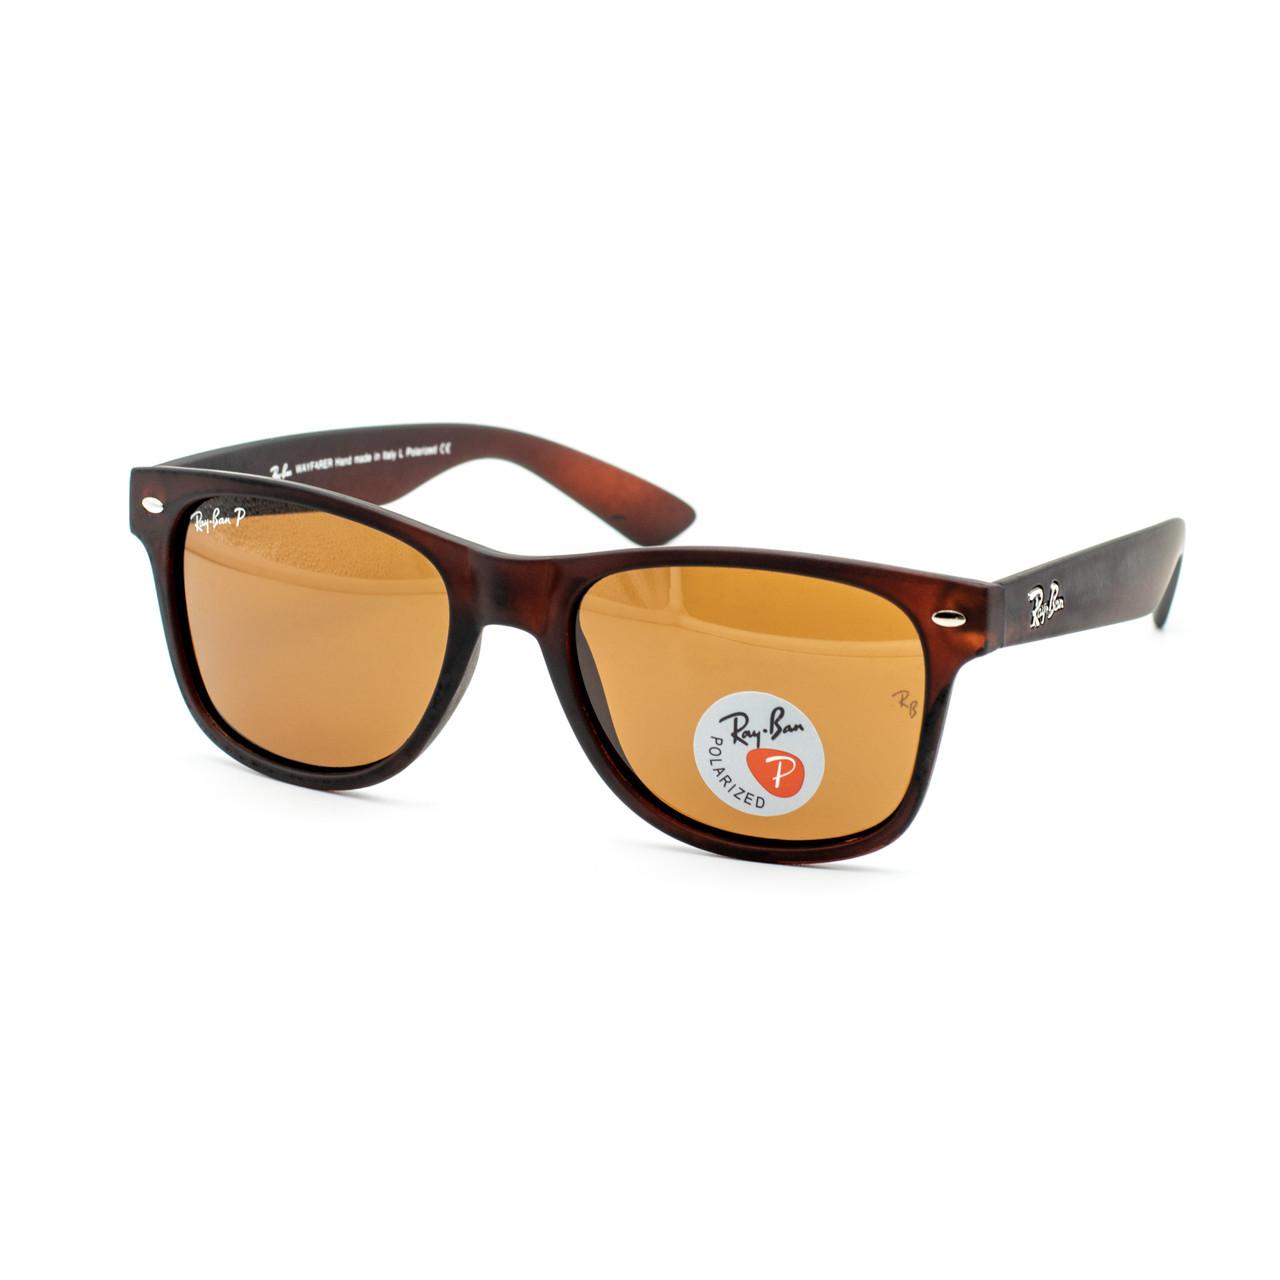 Очки Ray Ban Wayfarer brown матовые polarized (replica)